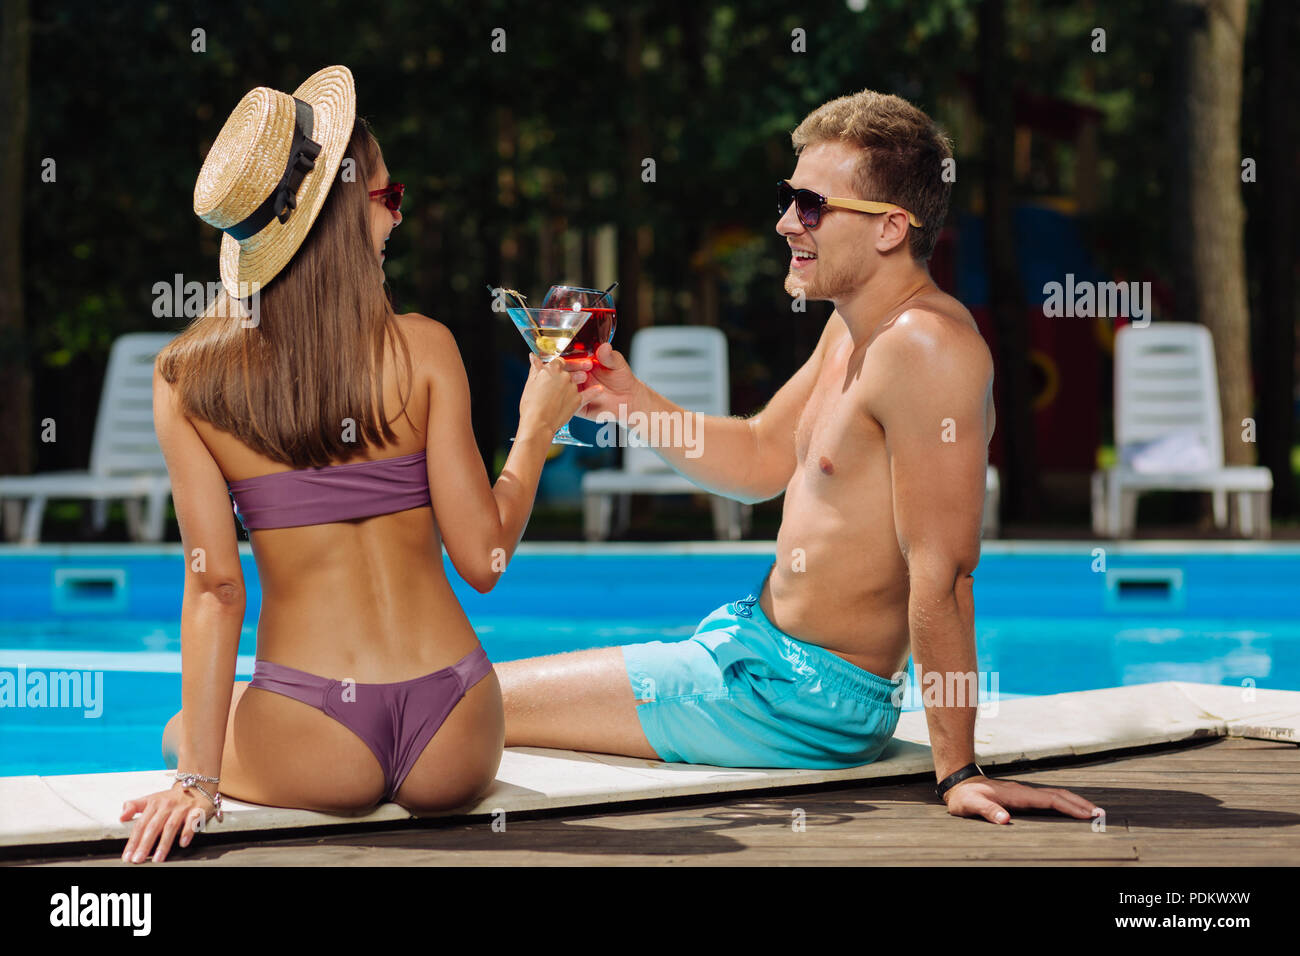 Slim woman wearing purple swimming suit sitting near boyfriend - Stock Image